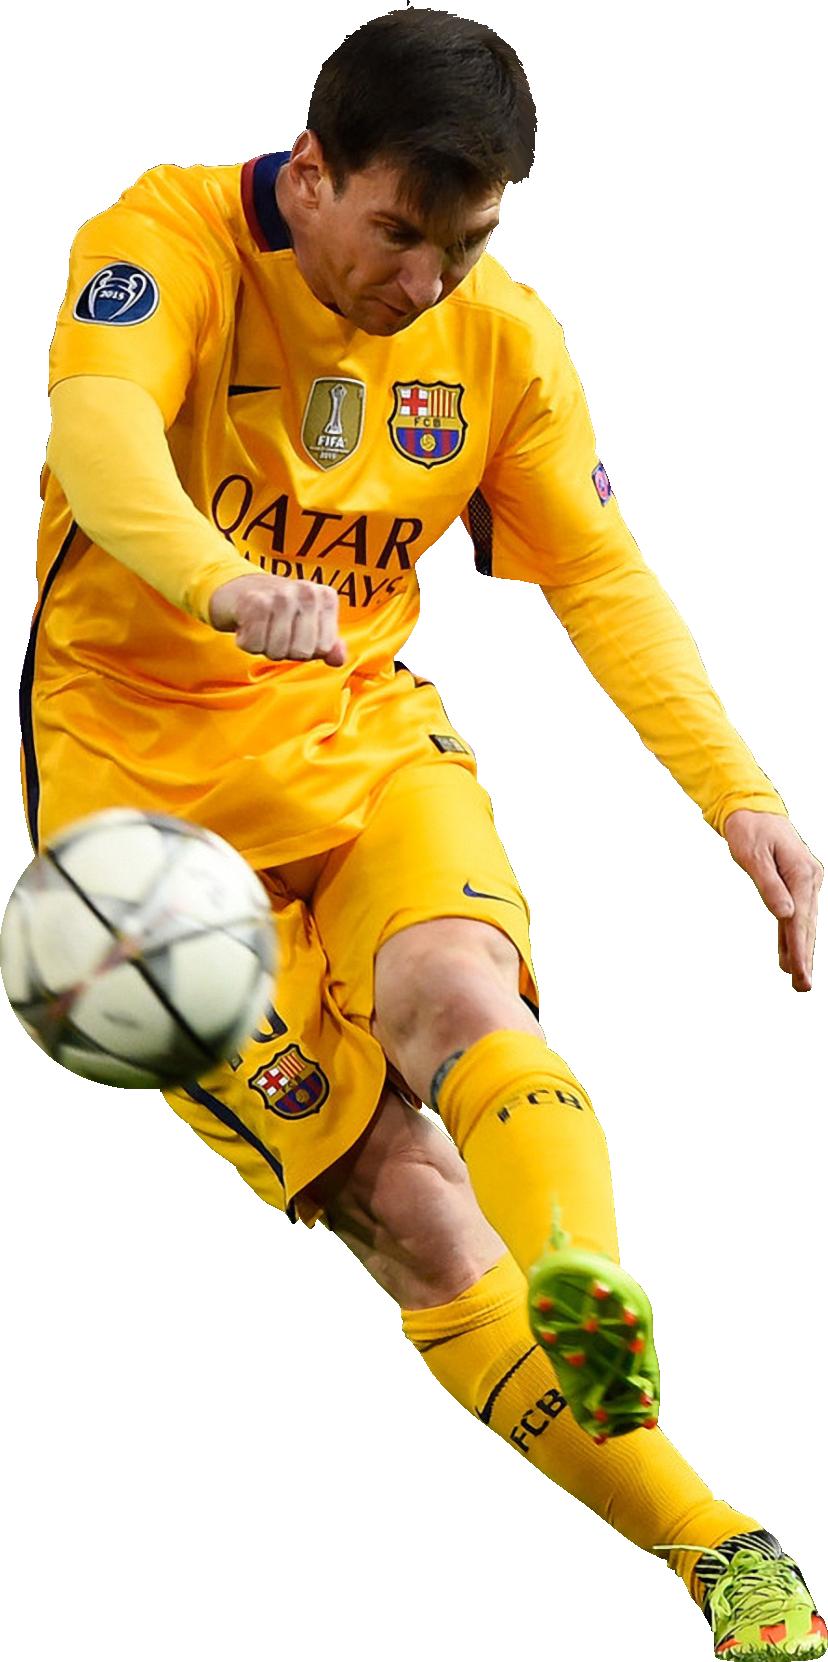 newest 76e4d 3d638 Lionel Messi football render - 25303 - FootyRenders